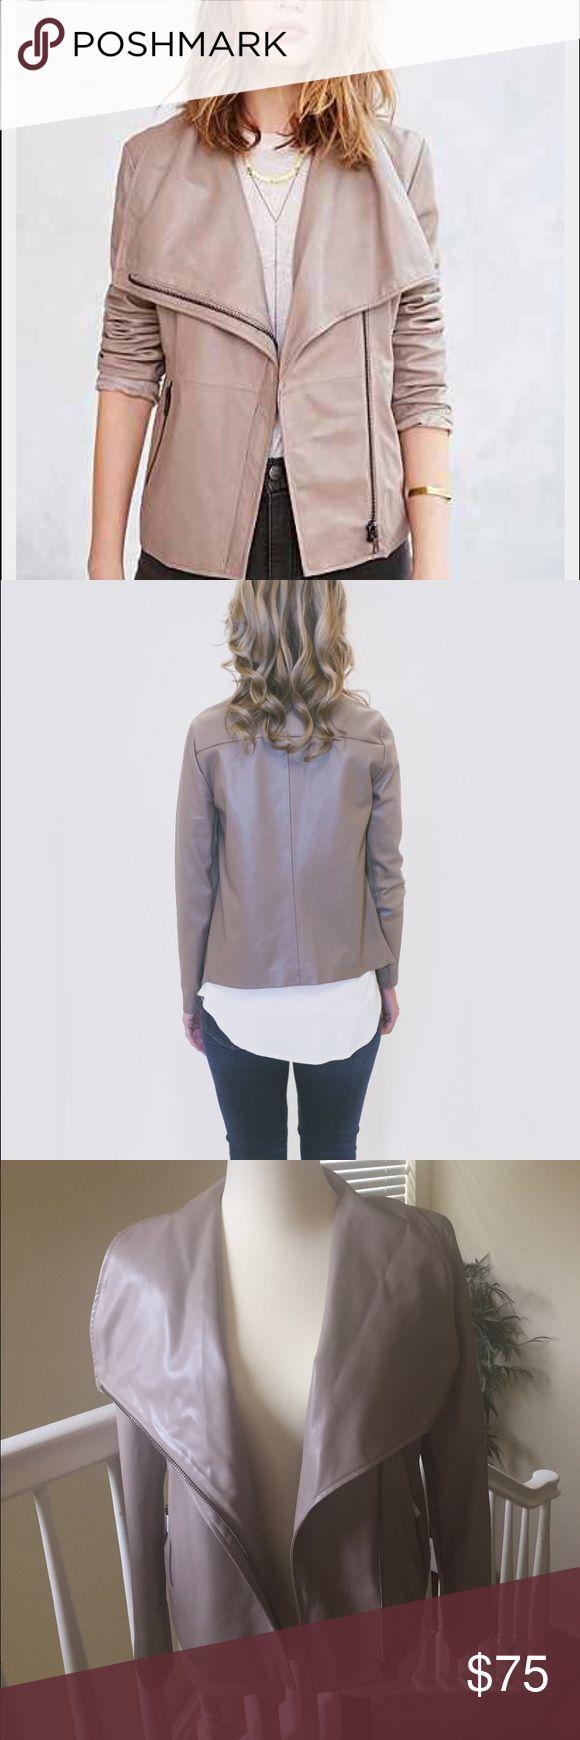 ❤HOST PICK❤️️BB Dakota jacket size L NWT ❤️ ❤️BB Dakota Jacket size L two side zip pockets. Very stylish. One small knick in it you can barely see. ❤️ NWT BB Dakota Jackets & Coats Utility Jackets